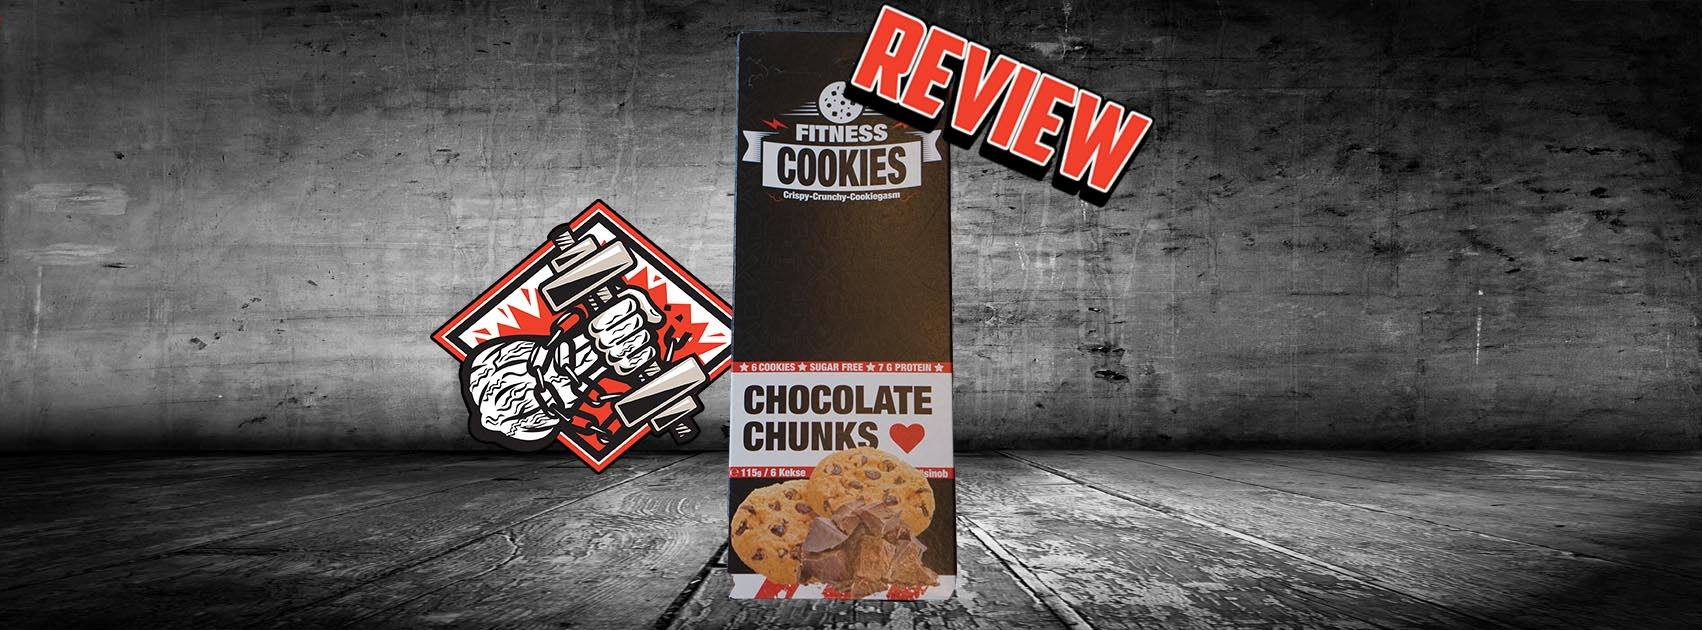 Fitness Cookies